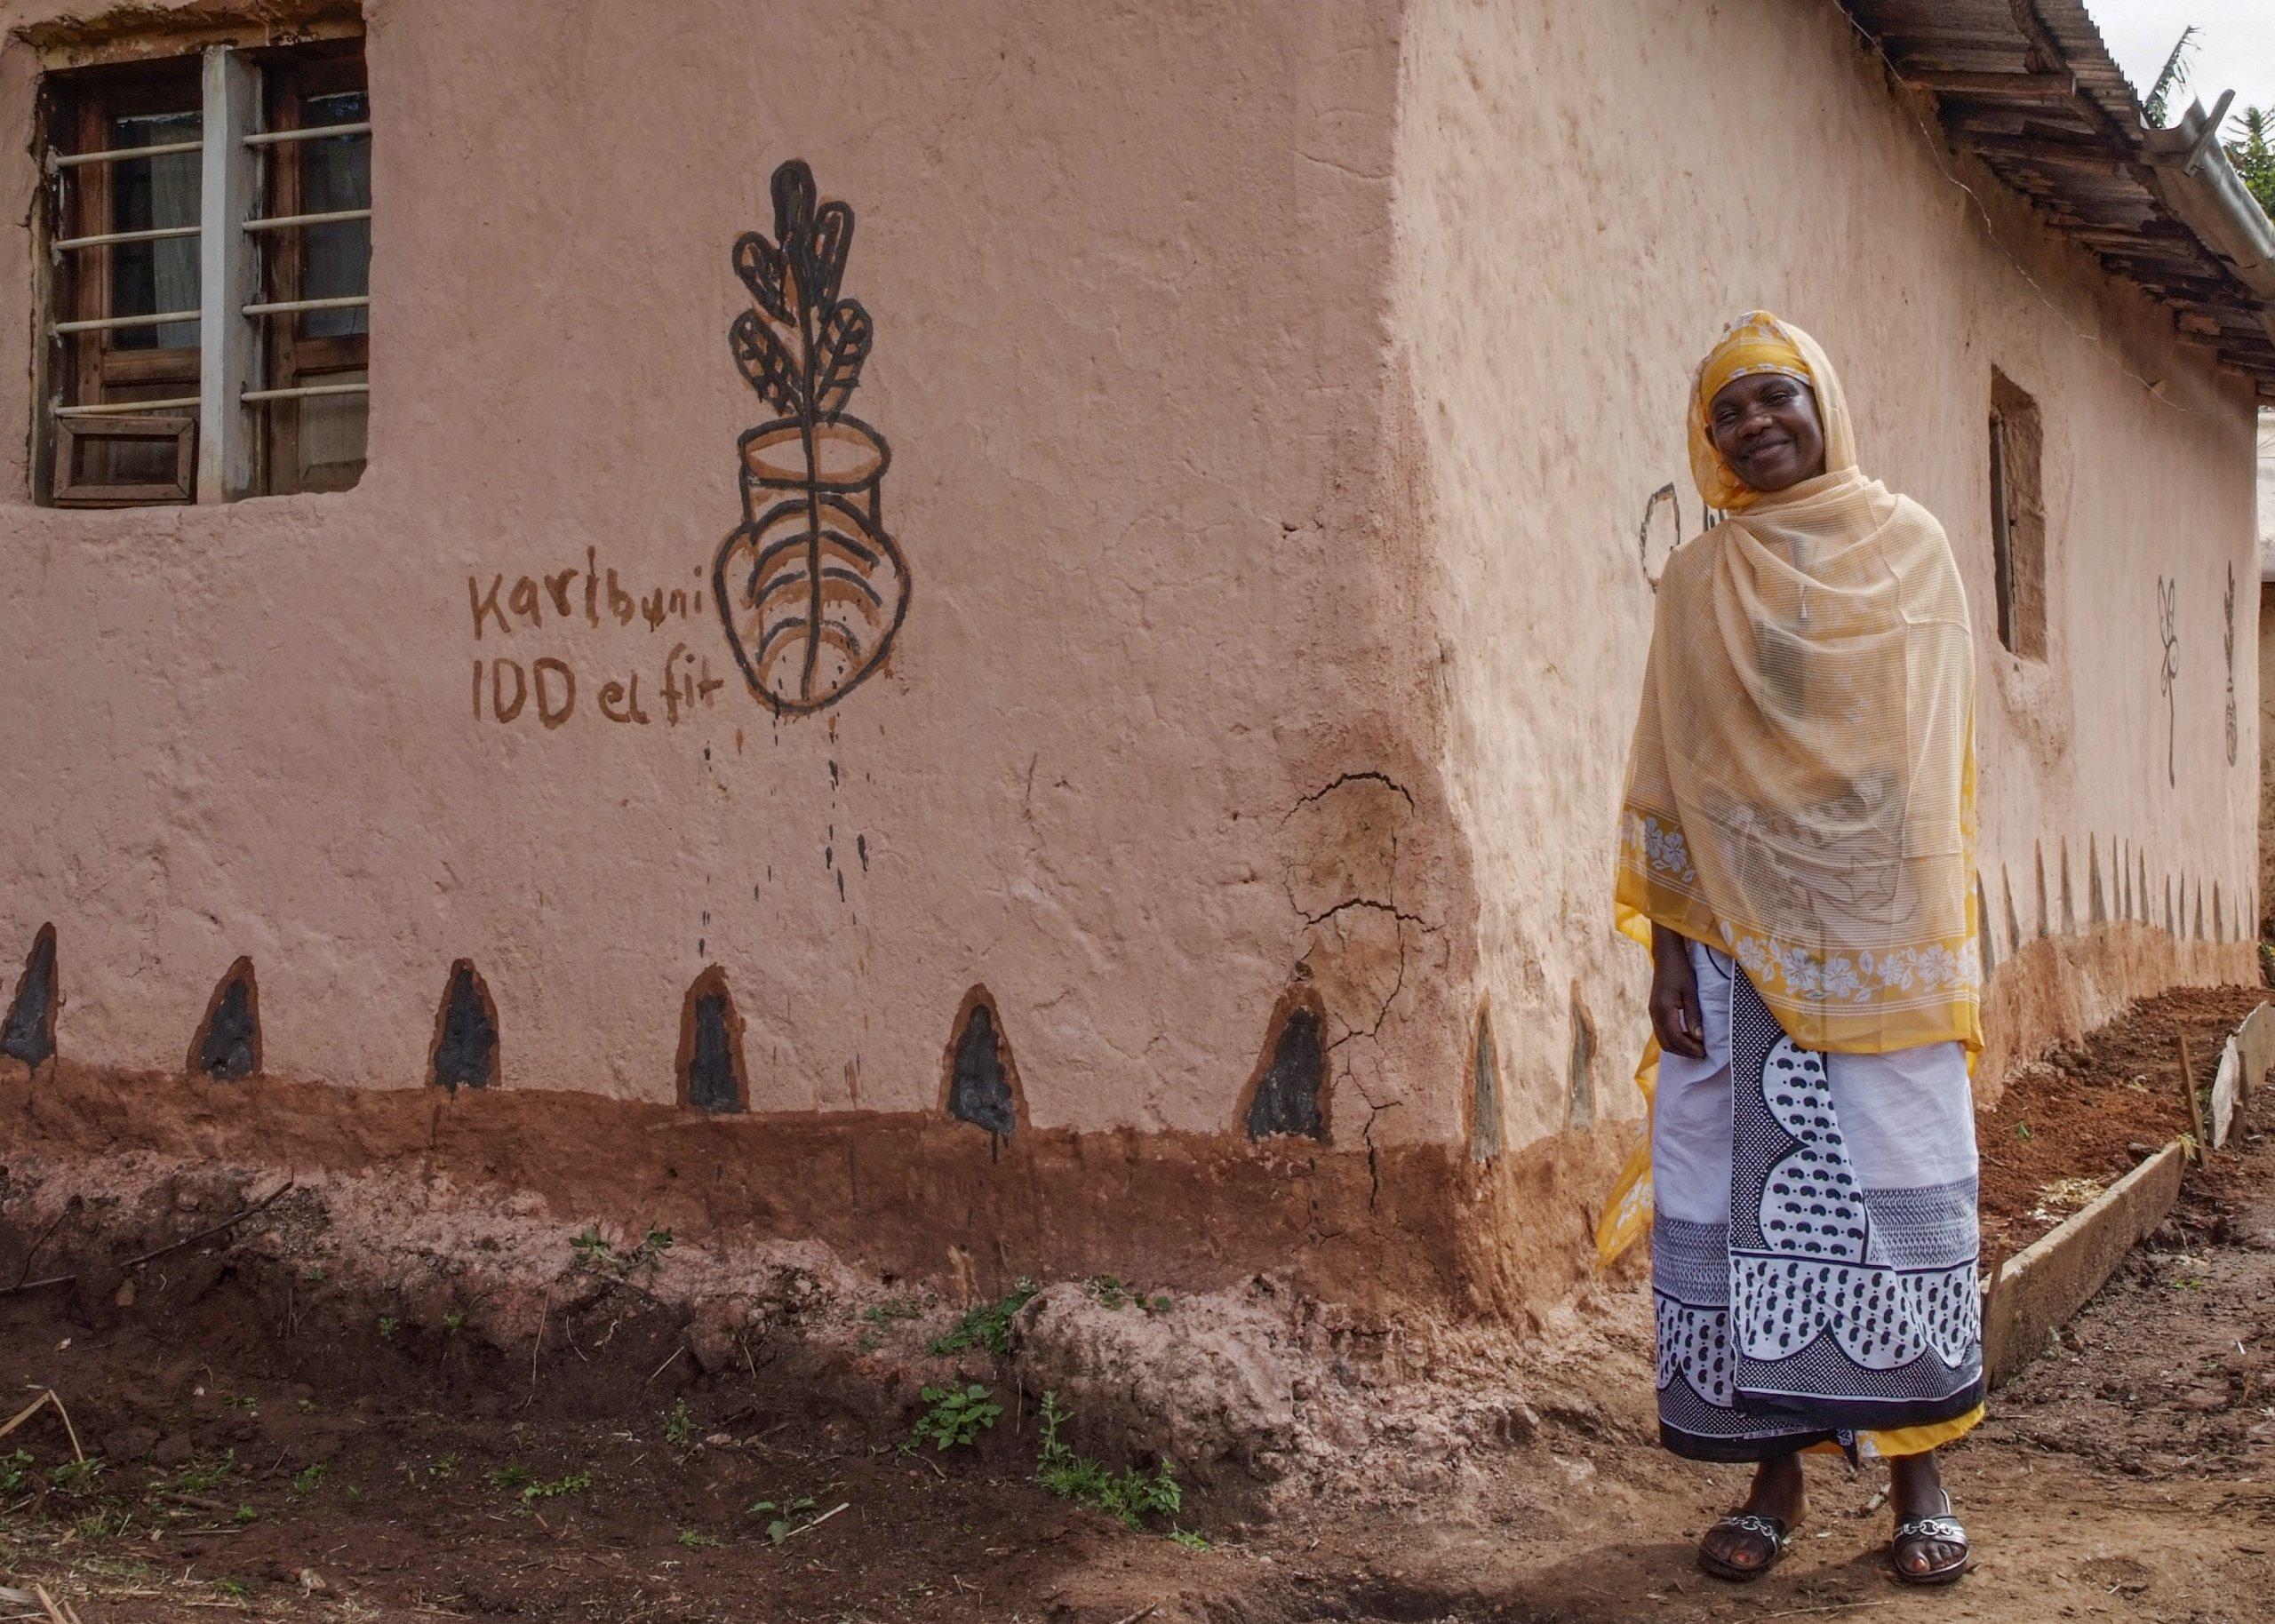 23 04 boerin trotsevrouw Asha Salimu Lushoto Tanzania 5175 scaled